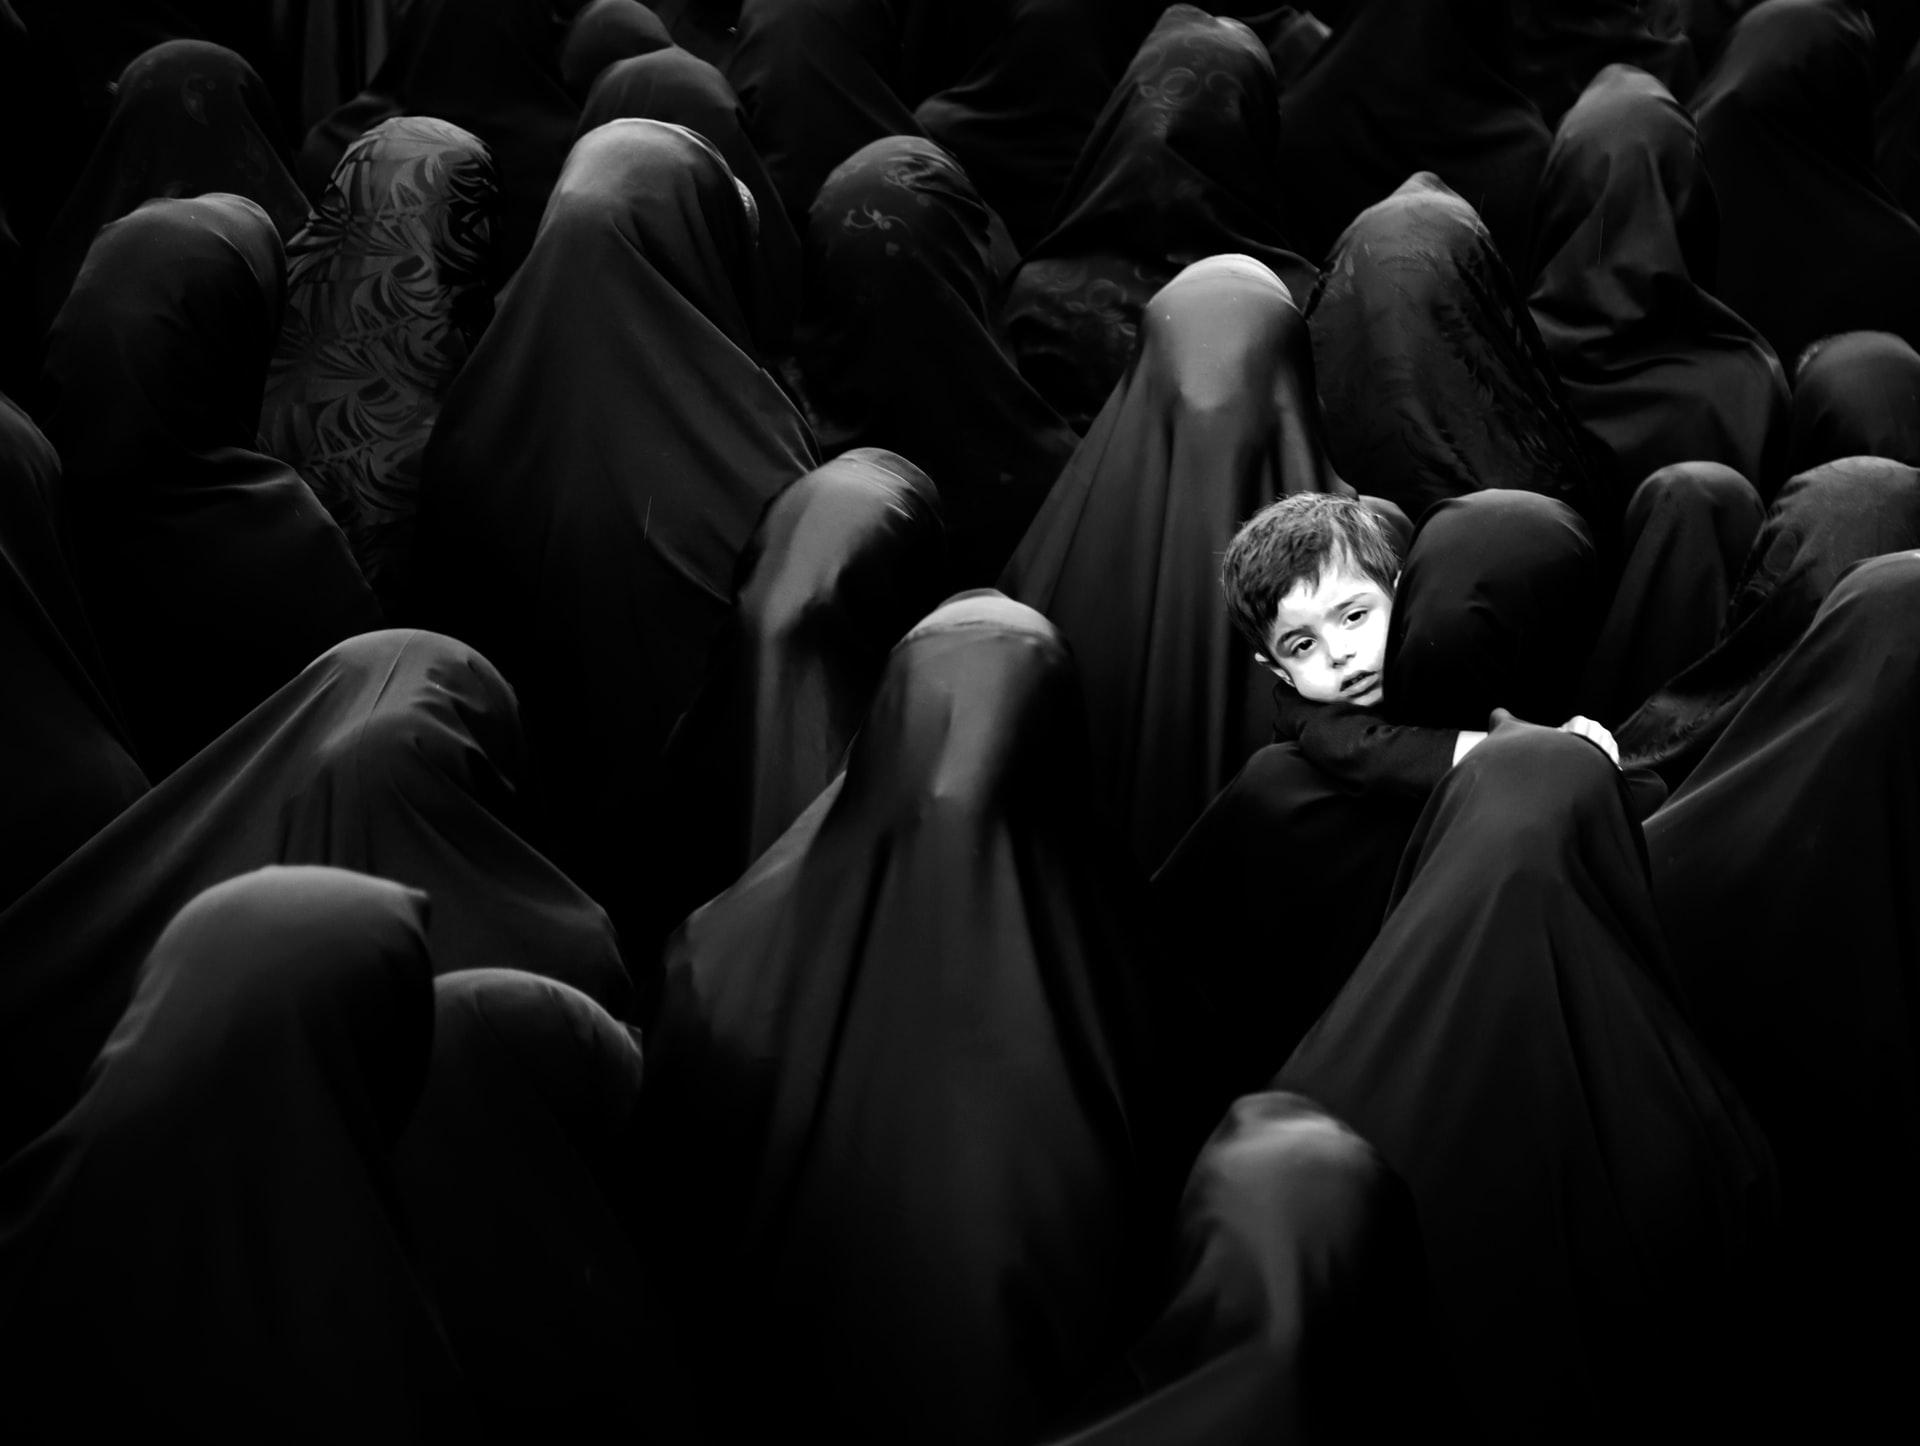 female Afghan judges